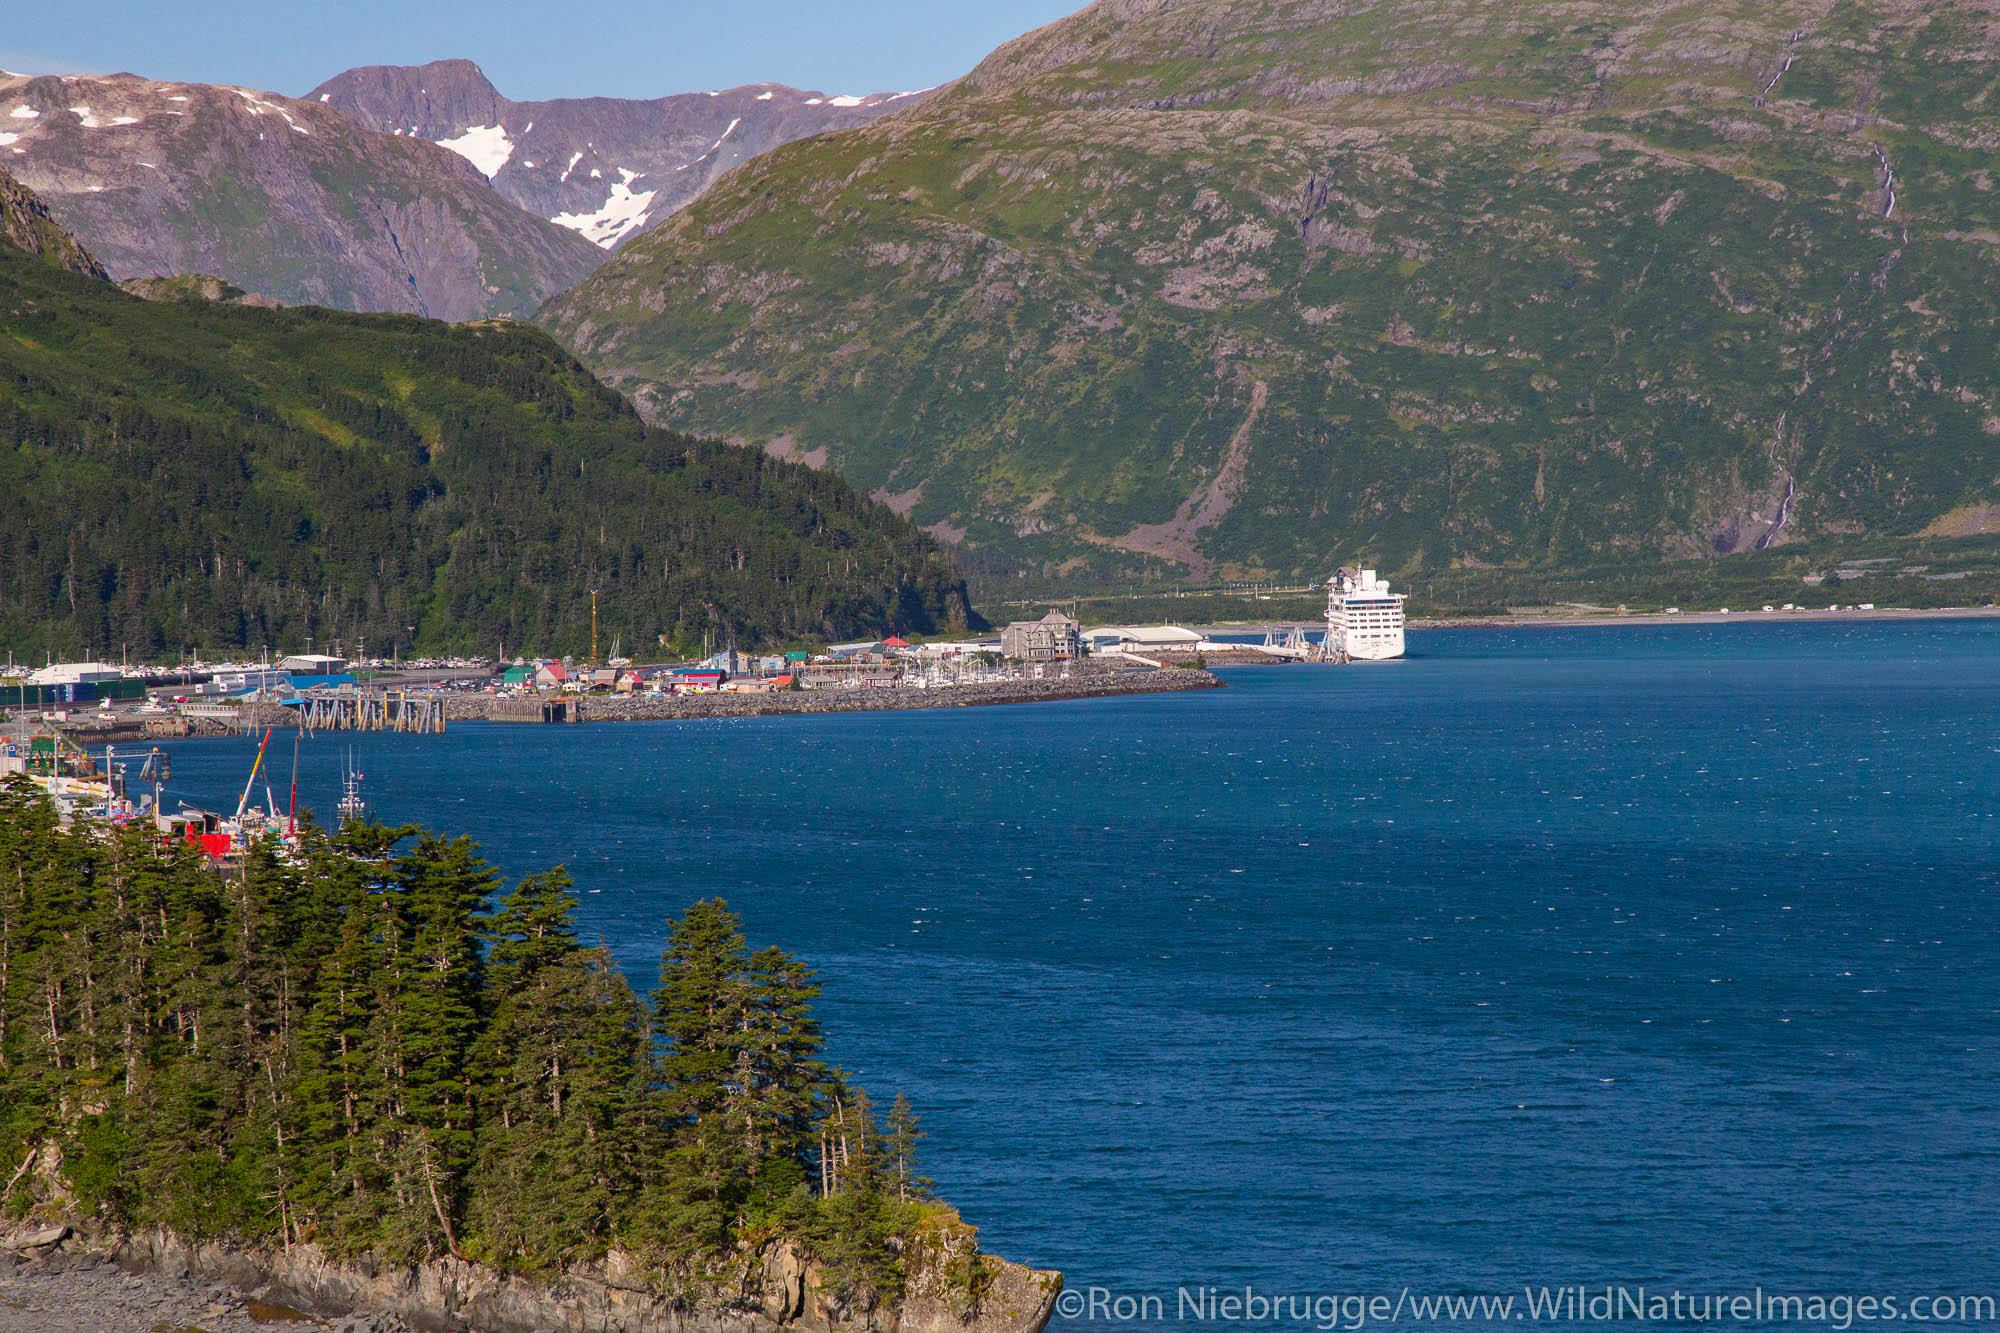 Whittier, Chugach National Forest, Alaska.